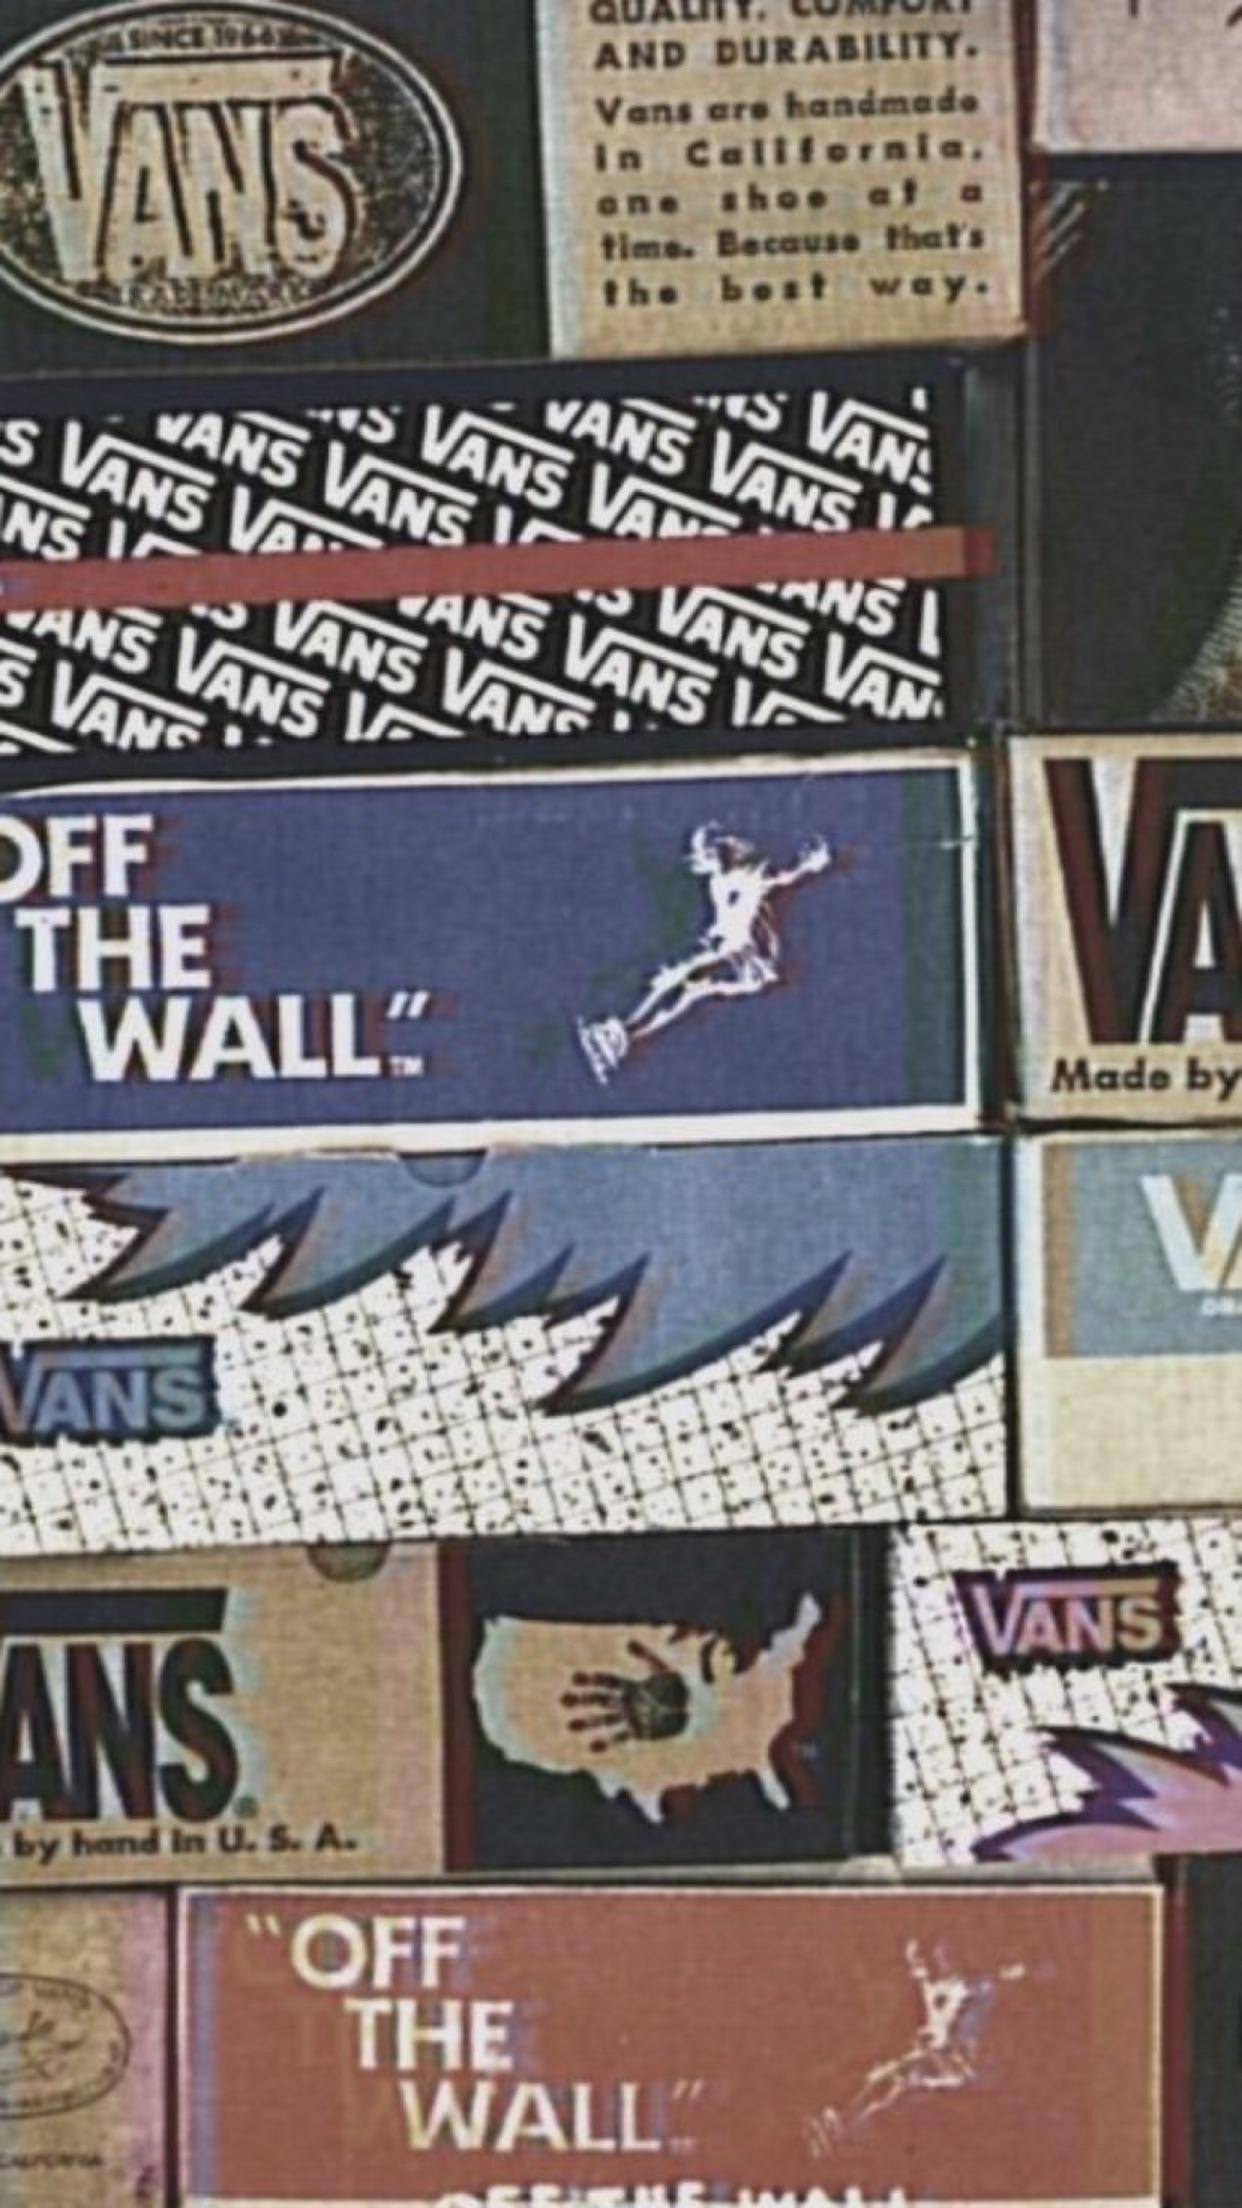 Vintage Edgy Grunge Aesthetic Wallpaper : vintage, grunge, aesthetic, wallpaper, Aesthetic, Wallpaper, Grunge, Iphone, Vintage,, Wallpaper,, Wallpapers, Vintage